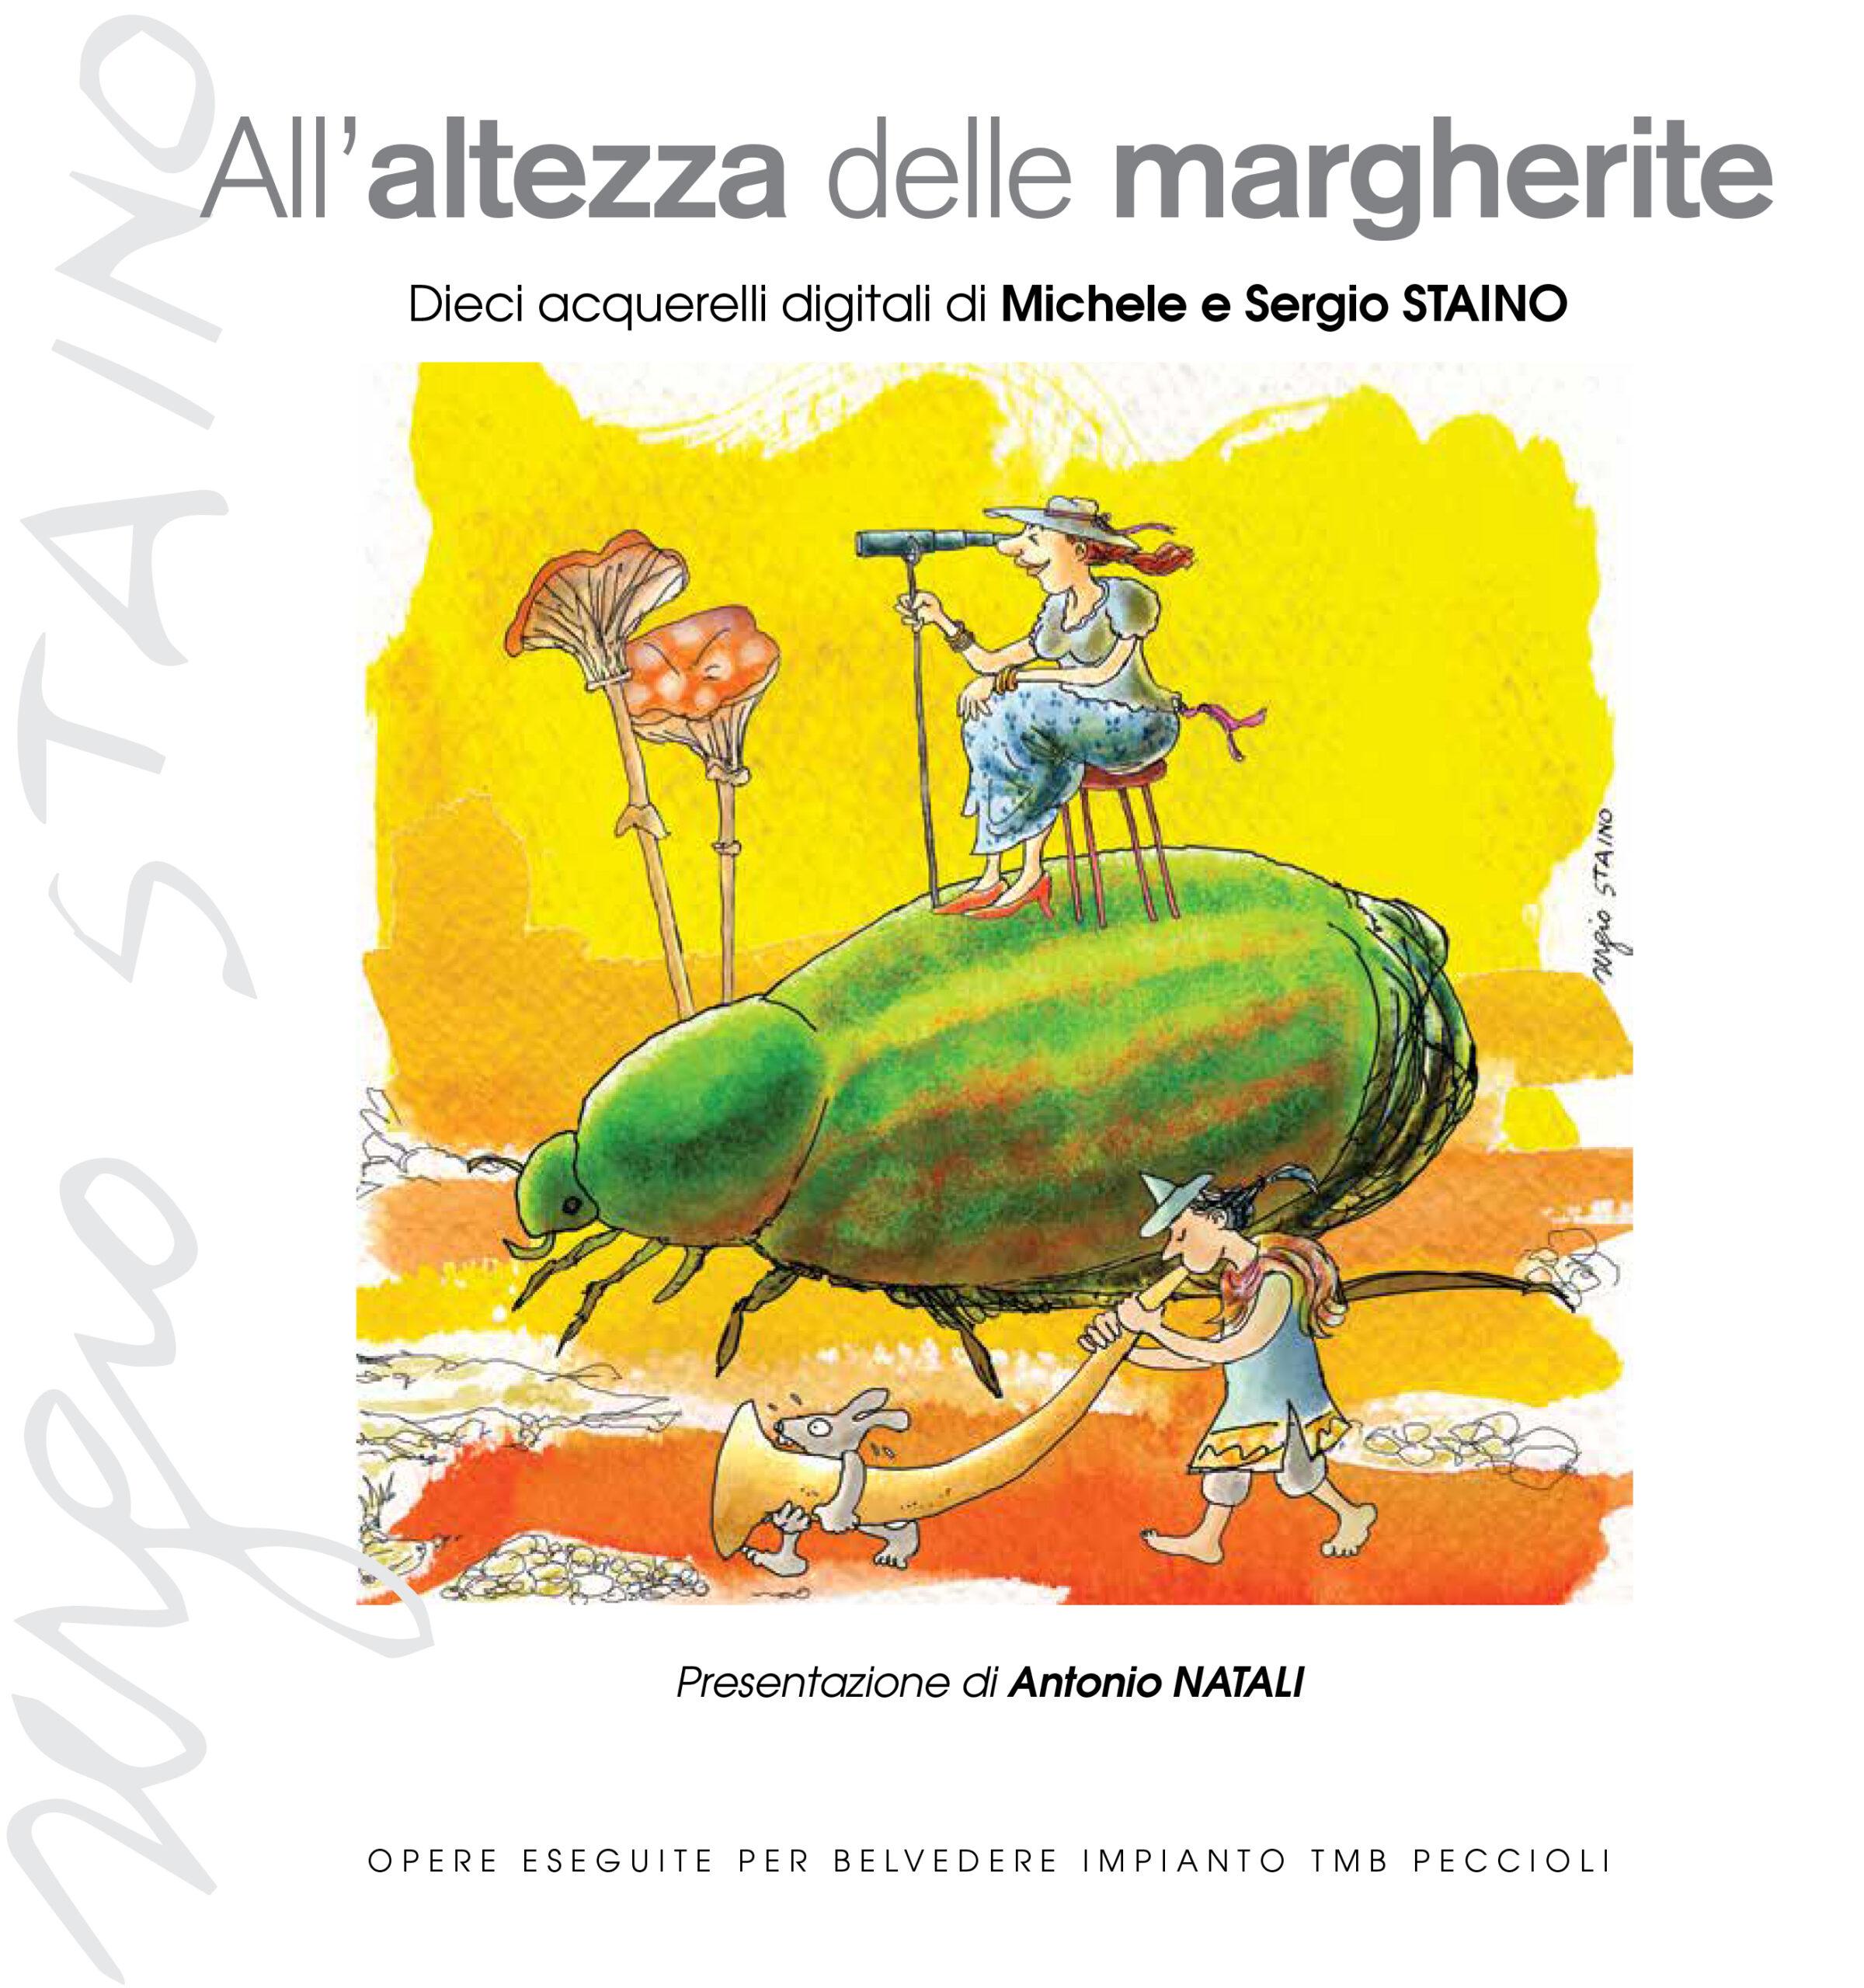 All'altezze_delle_margherite